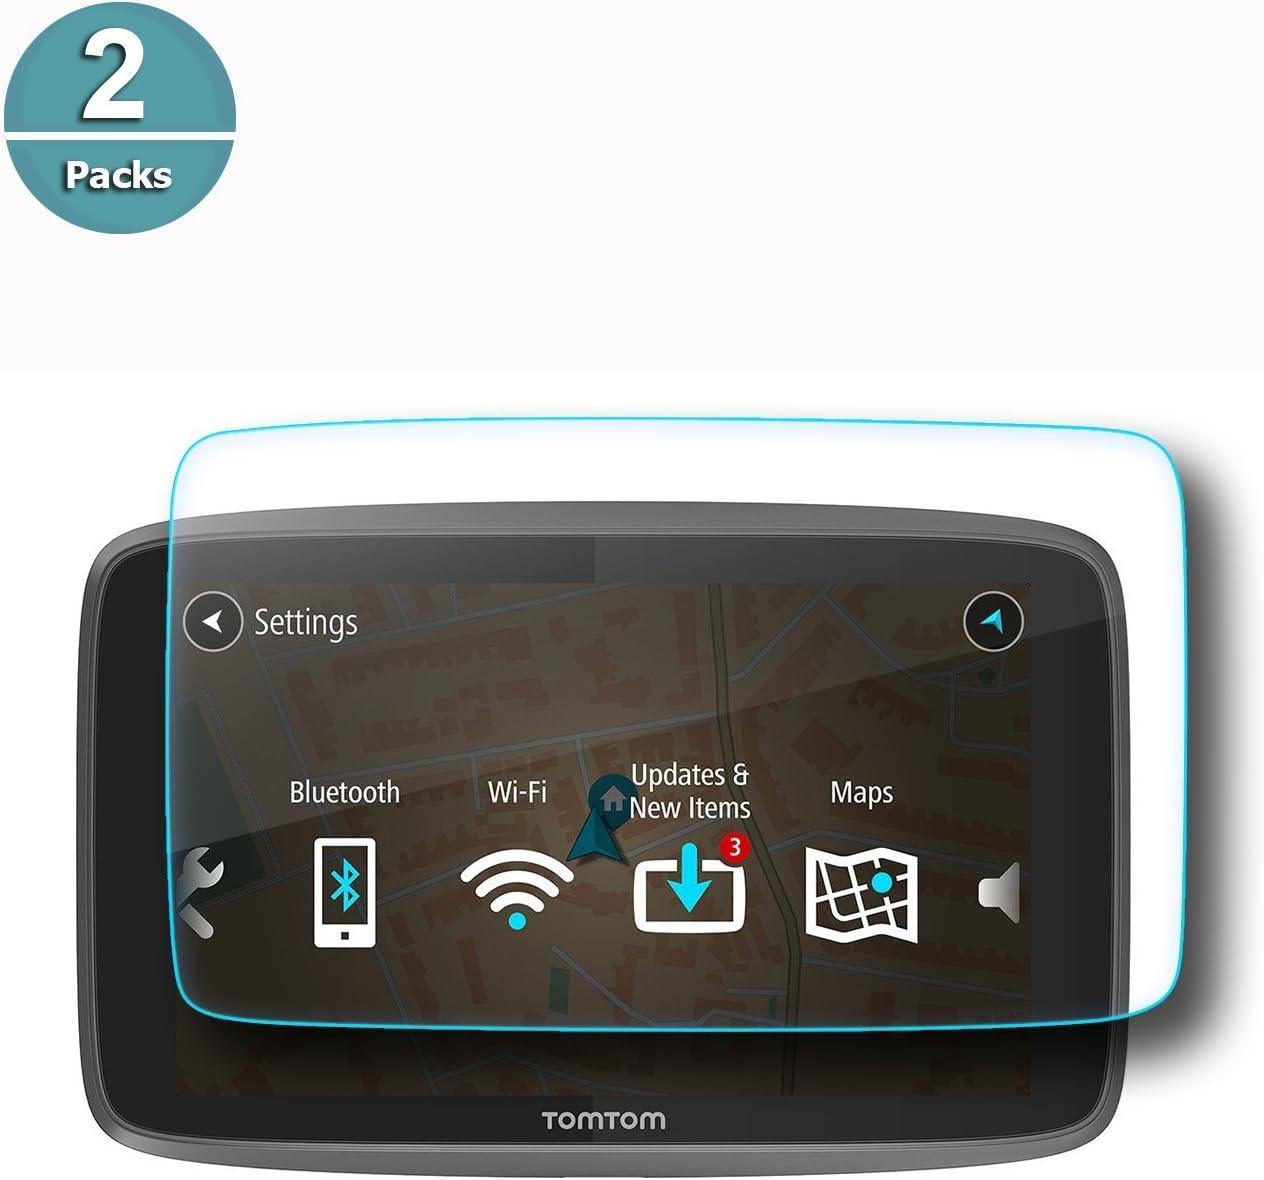 RUIYA Protector de pantalla de vidrio templado para TomTom GO 620 6200 6250 Sistema de navegación GPS, película protectora ultra transparente【6 pulgadas】